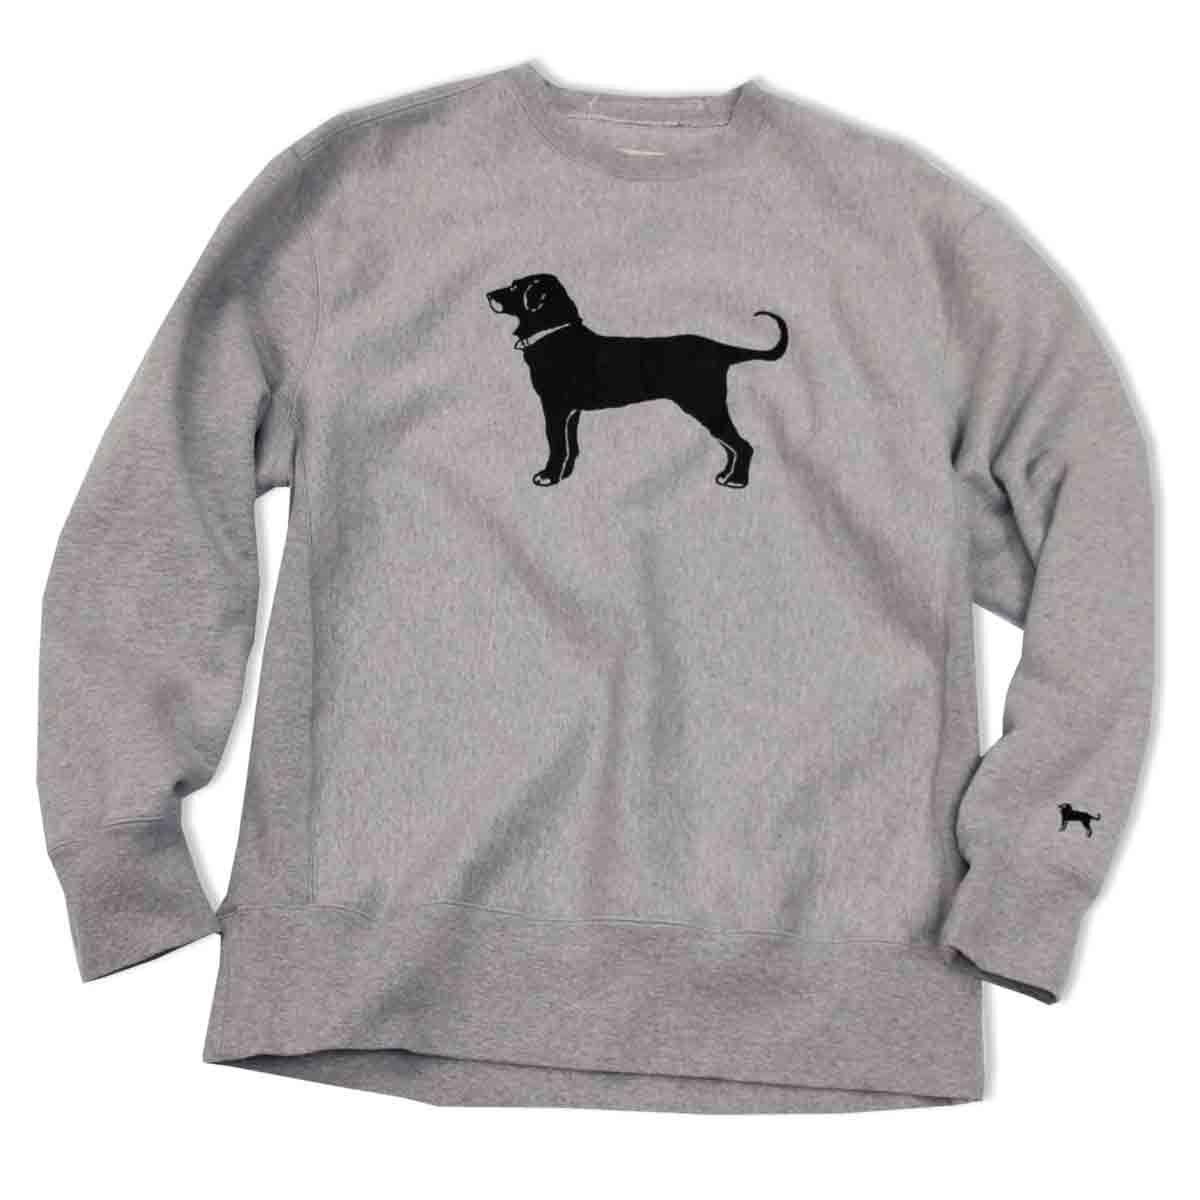 The Black Dog Mens Sweatshirts Mens Outfits Preppy Mens Fashion [ 1200 x 1200 Pixel ]